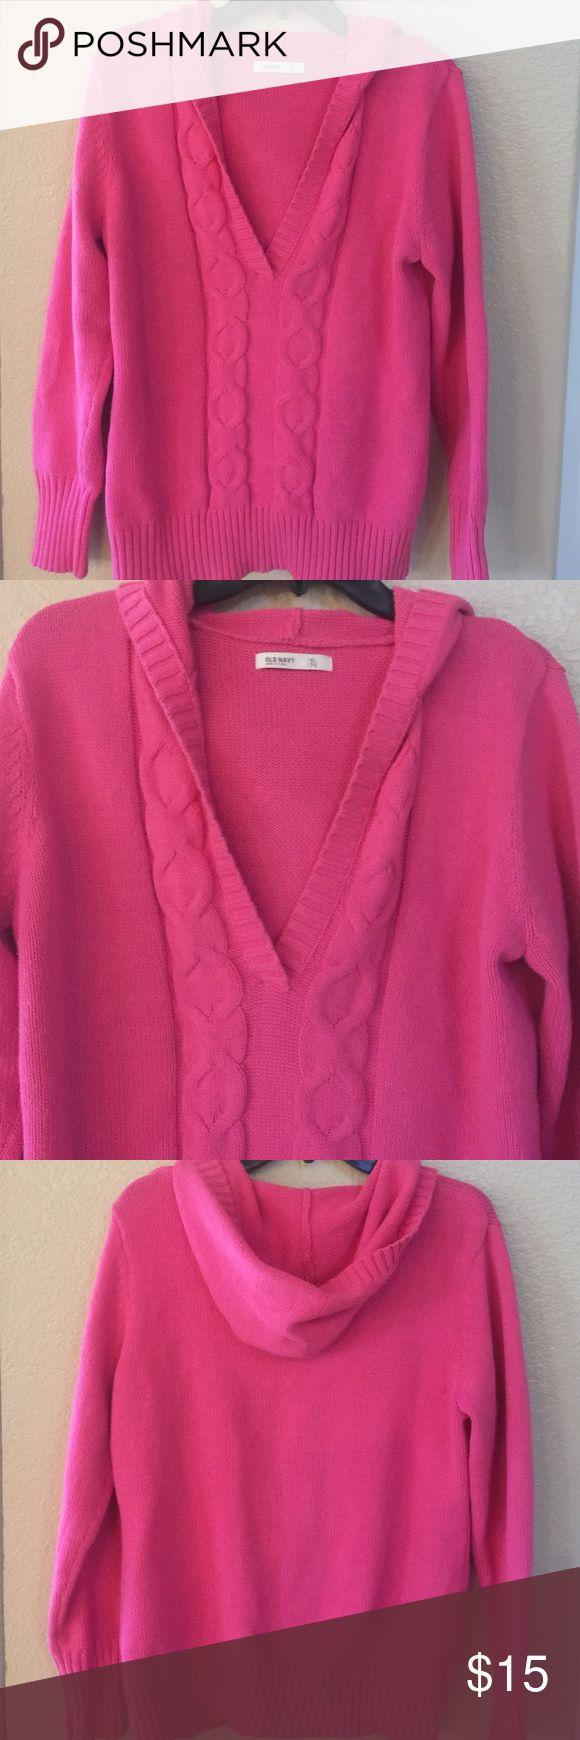 "Old Navy Pink Hoodie Sweater XL Old Navy Pink Hoodie Sweater XL, Chest 42"", Length 26"", V-Neck. Old Navy Sweaters"